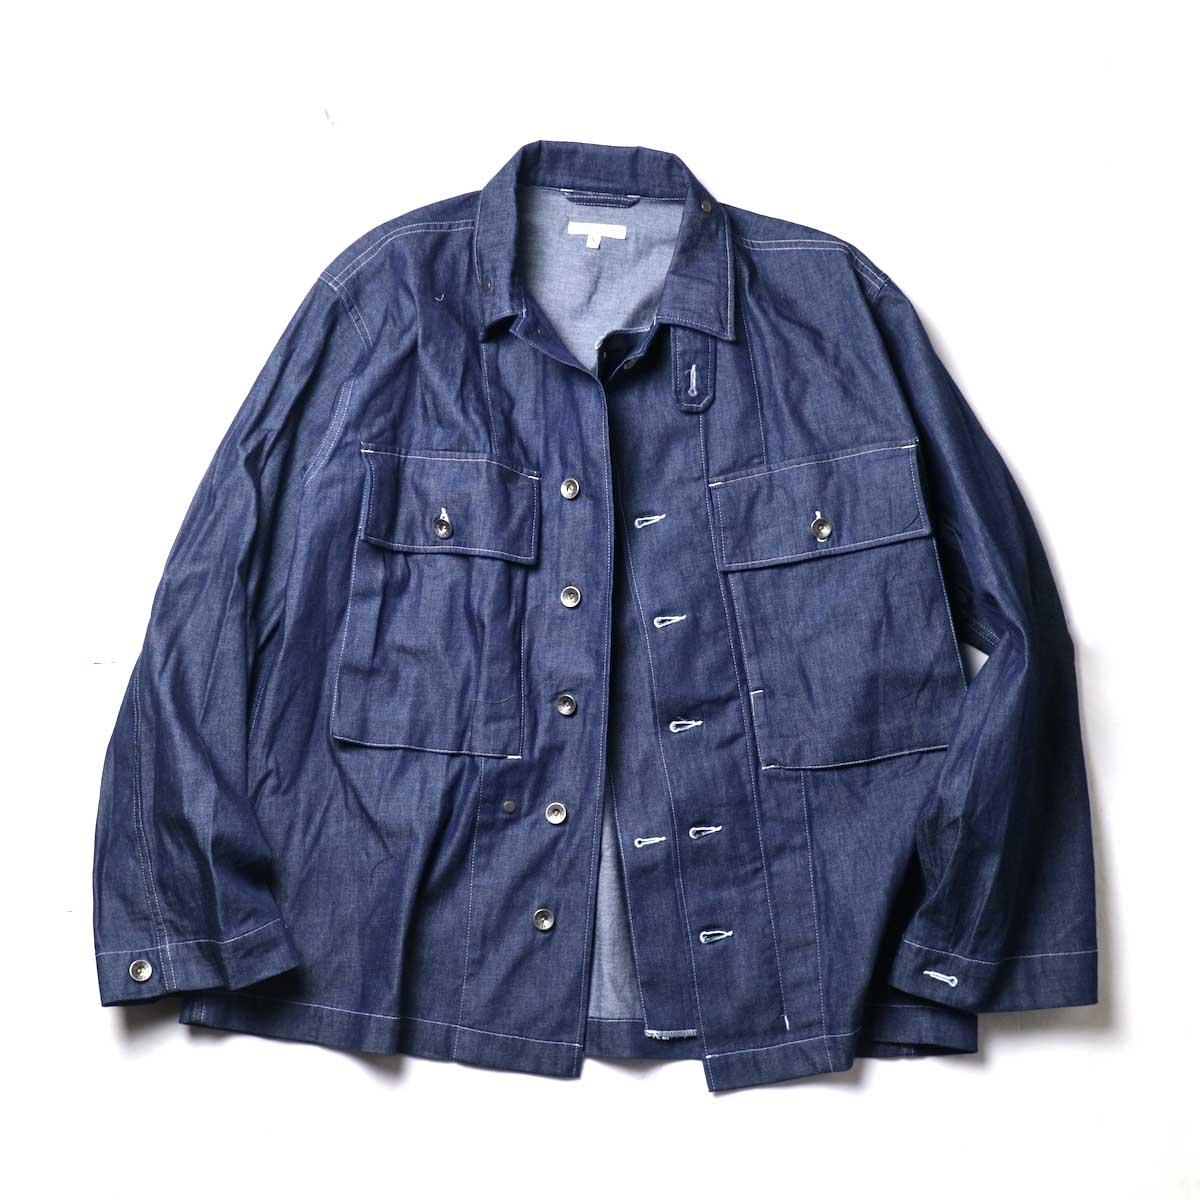 Engineered Garments / M43/2 Shirt Jacket -8oz Cone Denim(Indigo)